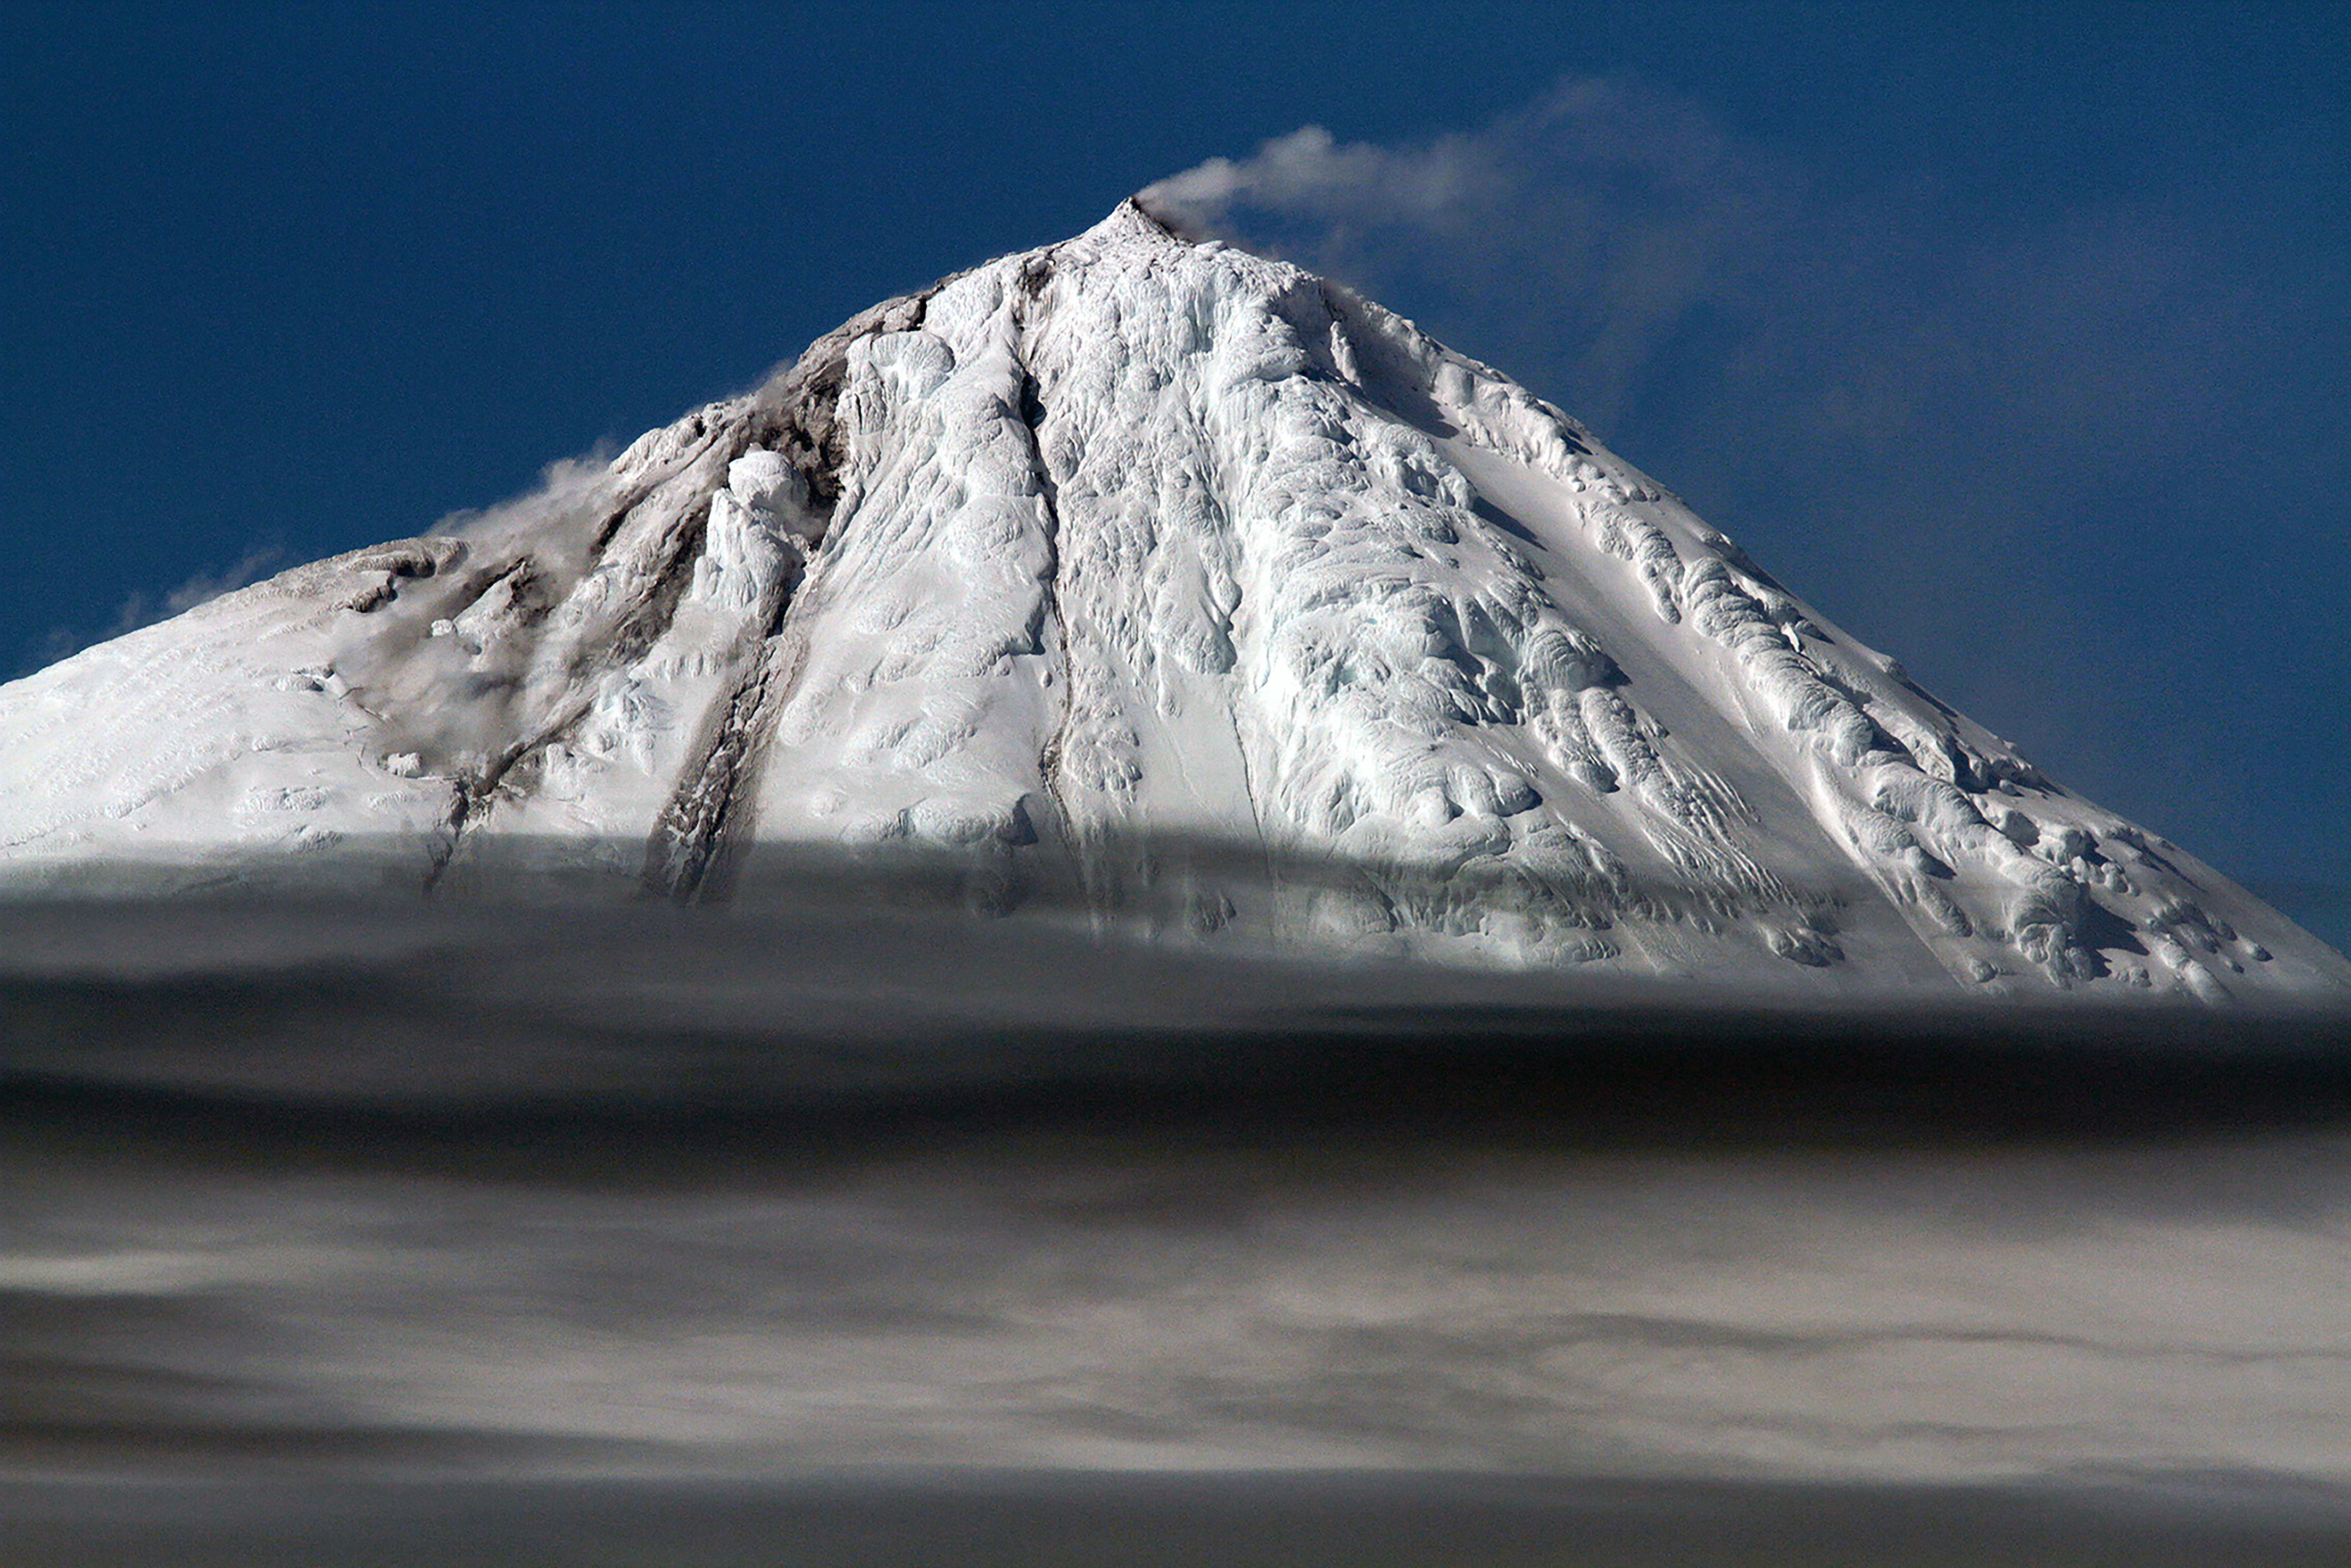 Big Ben erupting